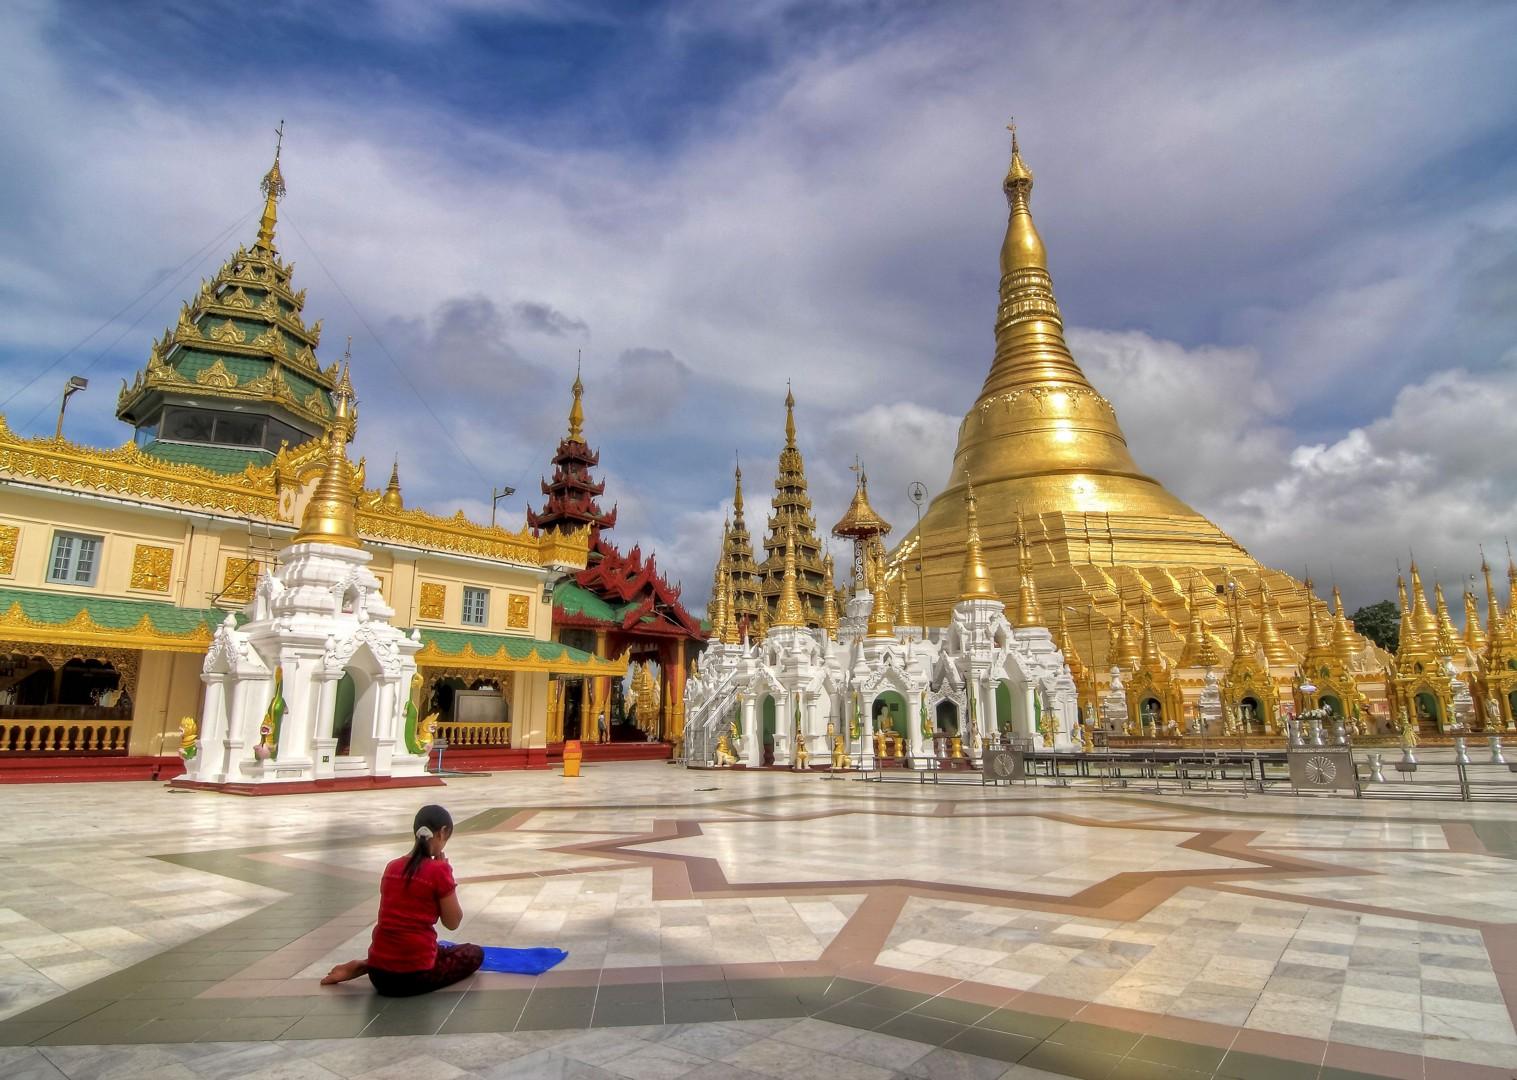 burma-guided-group-cycling-temples.jpg - Myanmar (Burma) - Bagan and Beyond - Cycling Adventures